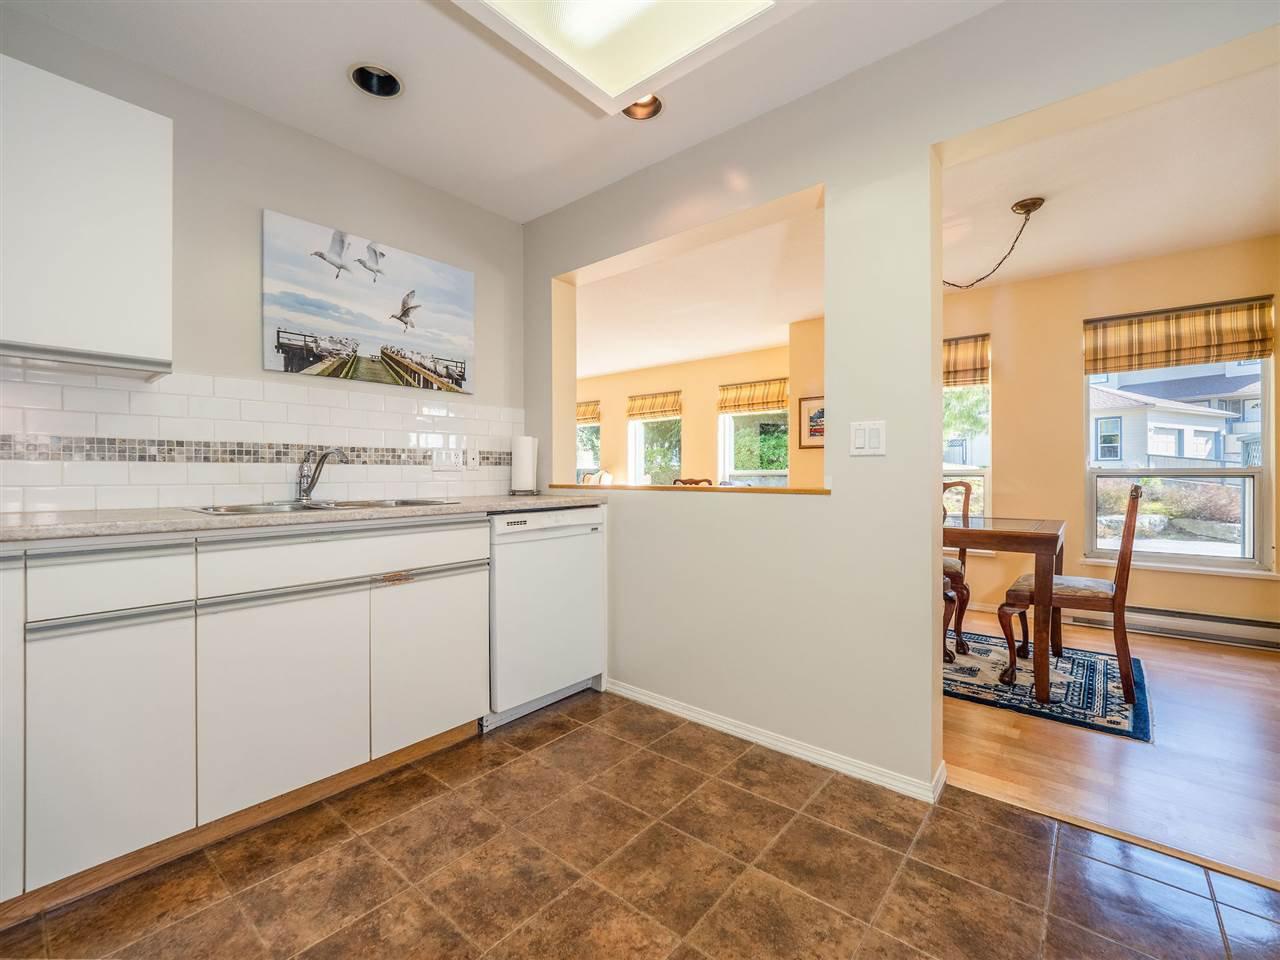 "Photo 7: Photos: 105 5768 MARINE Way in Sechelt: Sechelt District Condo for sale in ""Cypress Ridge"" (Sunshine Coast)  : MLS®# R2446337"